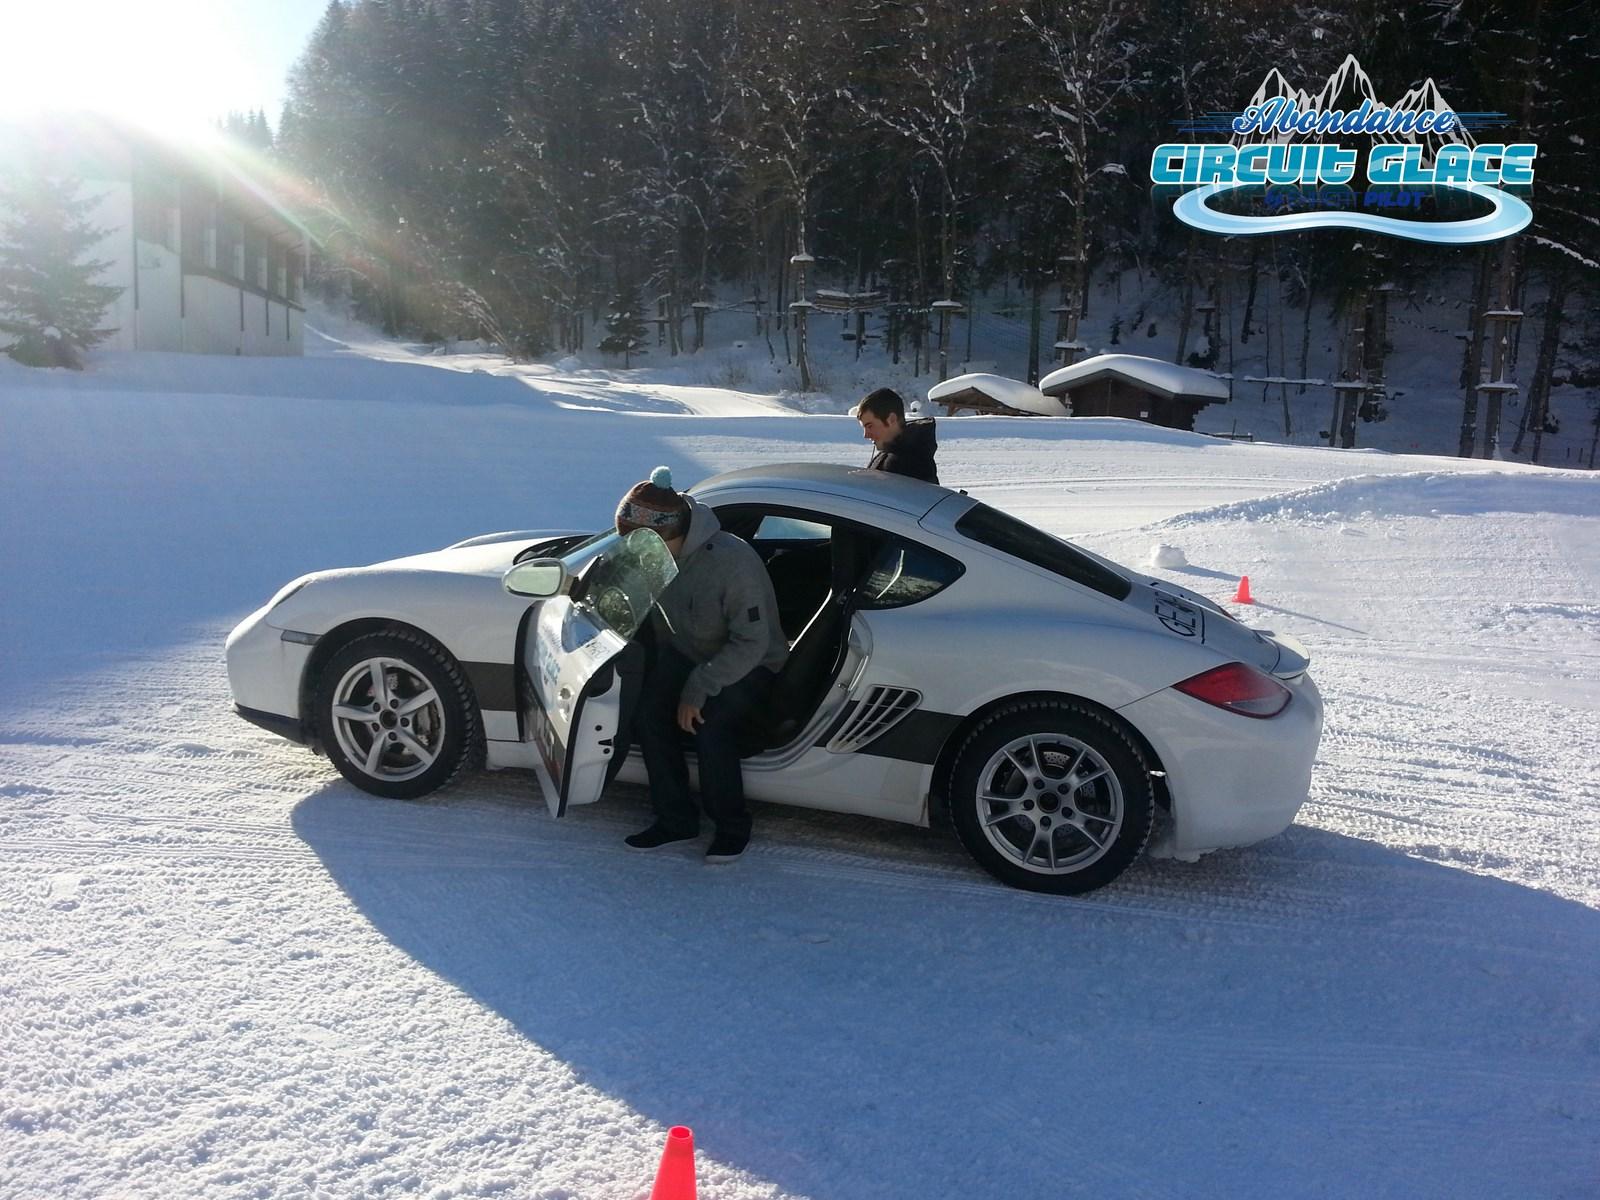 Circuit-abondance-stage-conduite-glace (11)